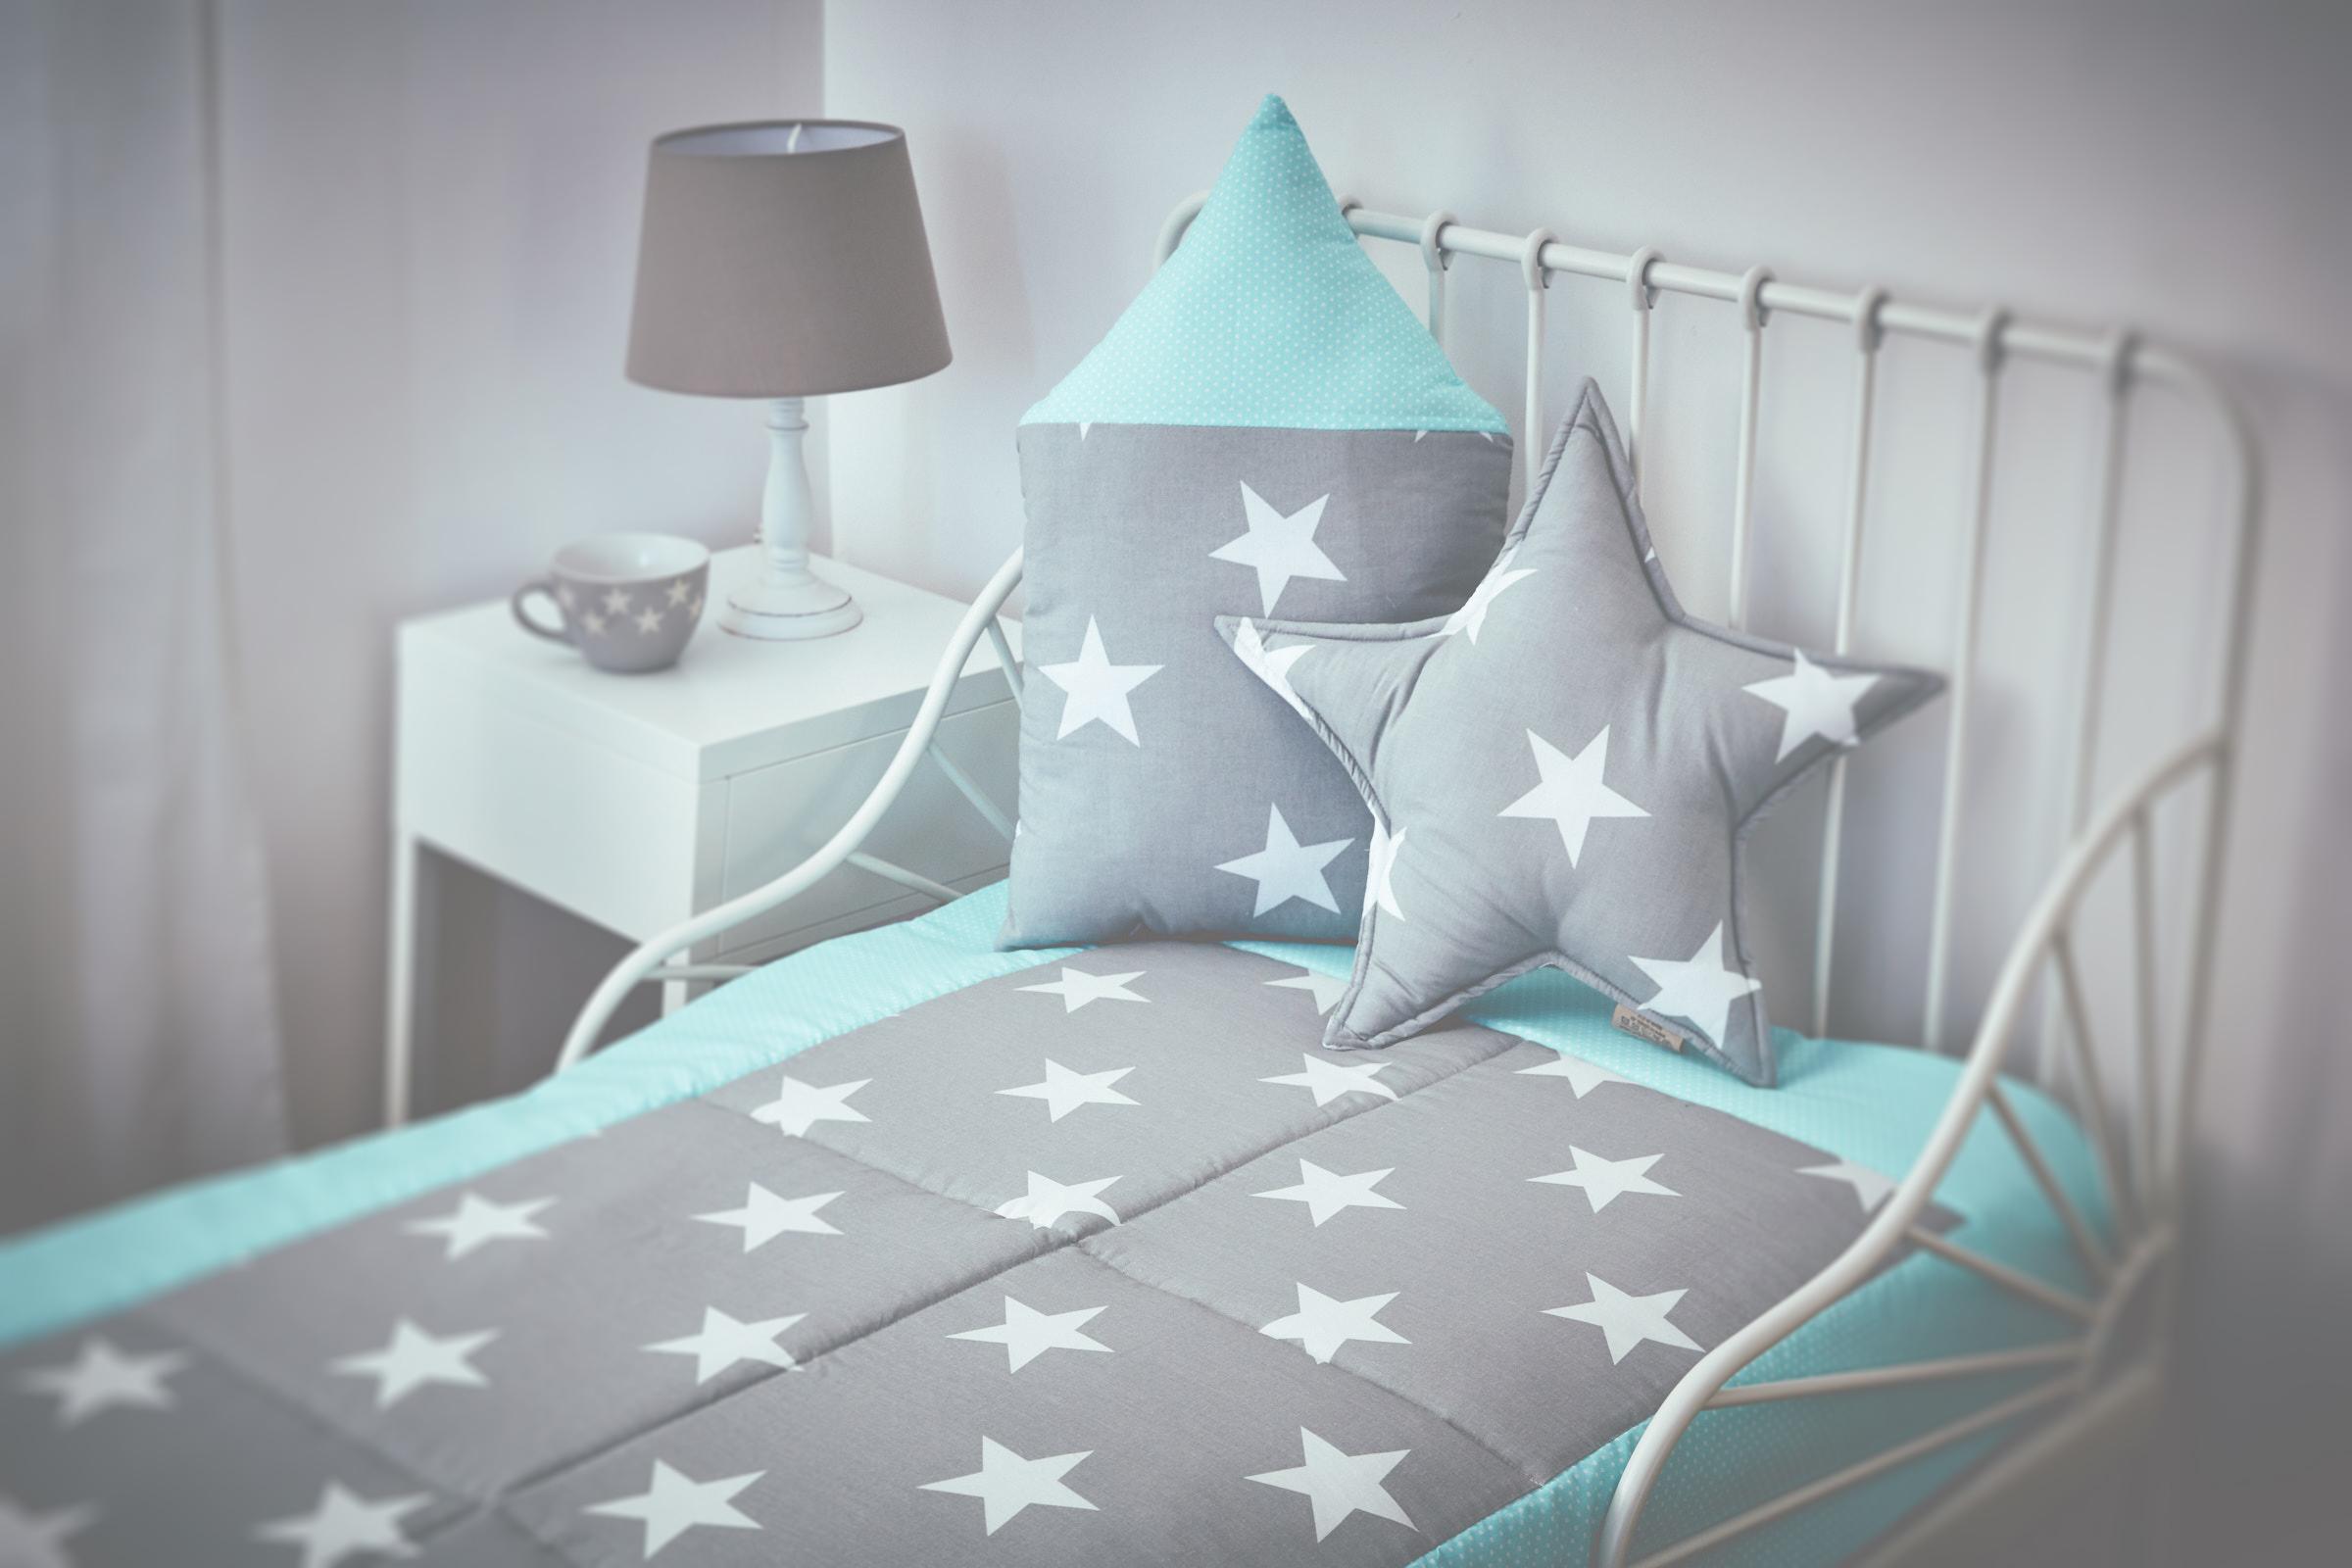 kraftkids tagesdecke gro e wei e sterne auf grau und wei e. Black Bedroom Furniture Sets. Home Design Ideas